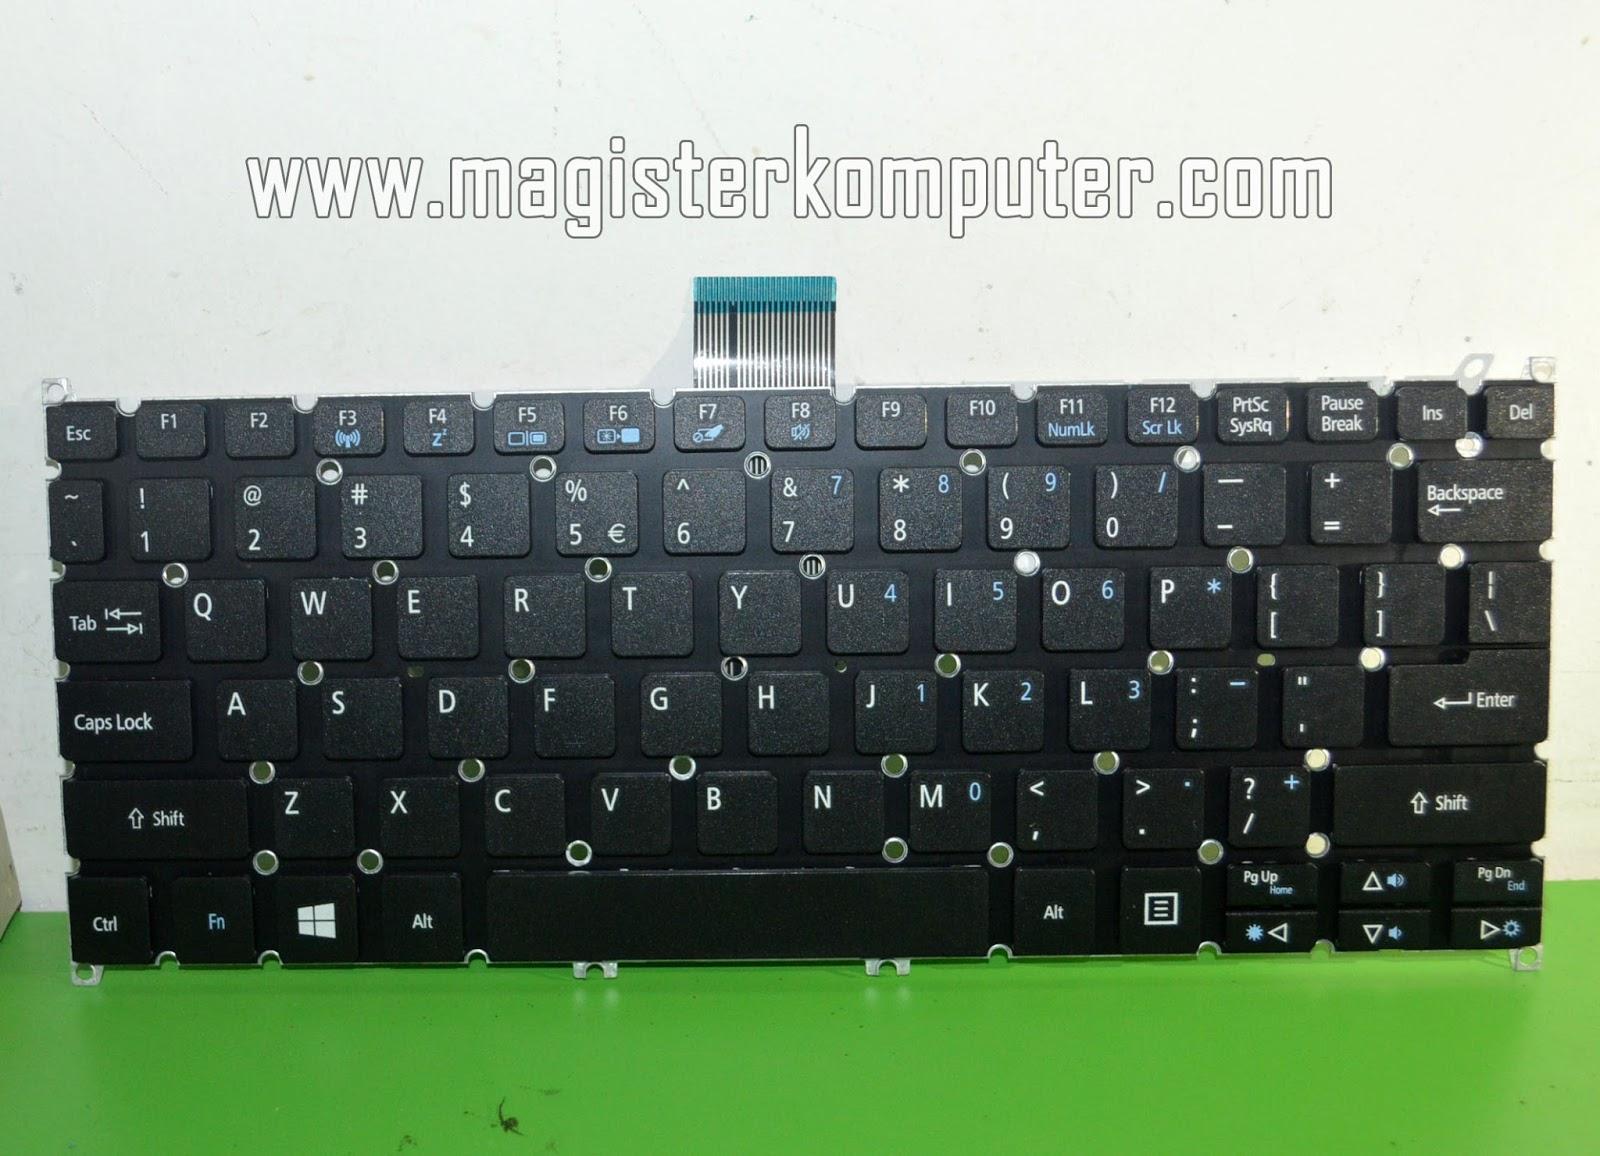 Jual Keyboard Acer Aspire One 725 726 756 V5 131 121 Laptop 14 Z1401 Z1402 E3 111 112 E11